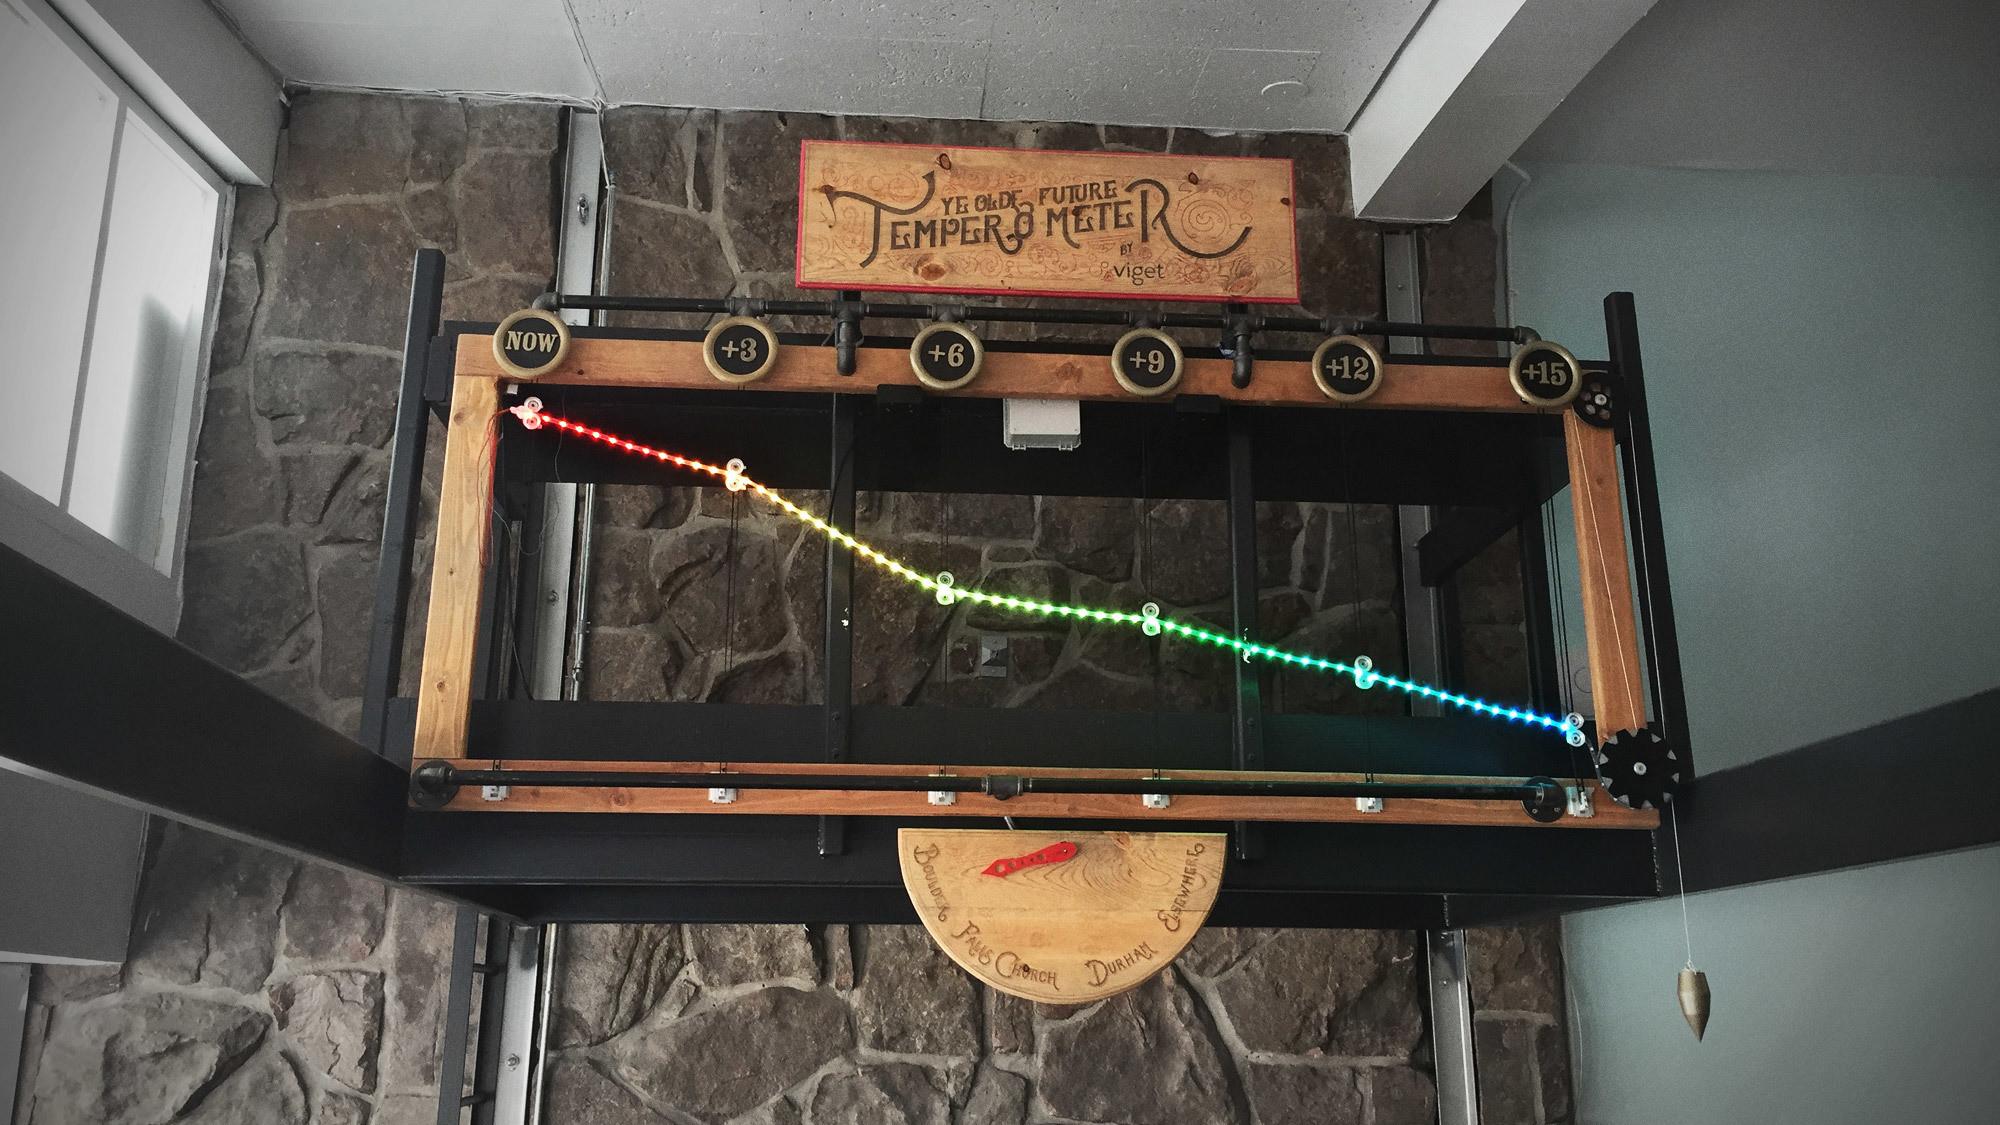 Ye Olde Future Temper-O-Meter